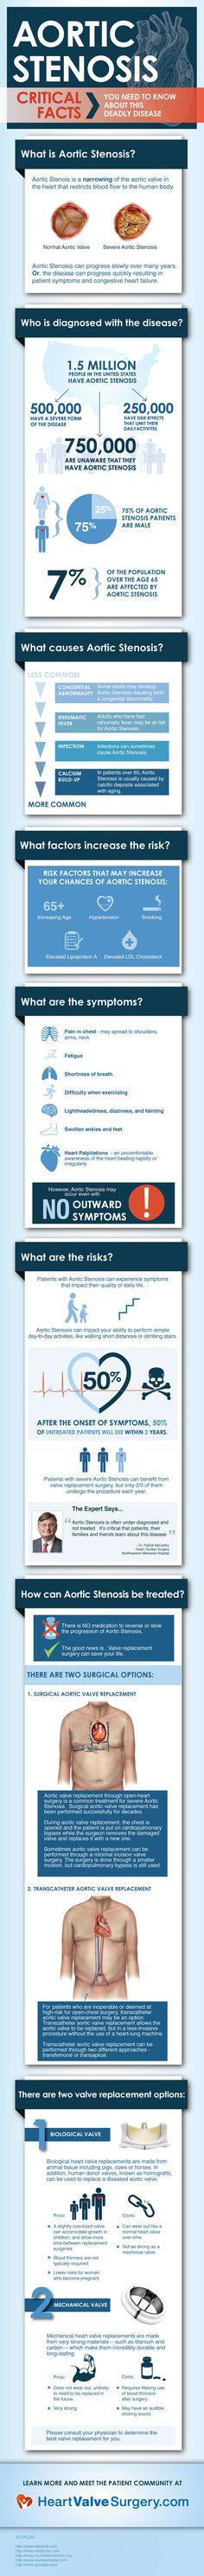 New Aortic Stenosis Infographic Raises Social Awareness to Dangers of Heart Valve Disease